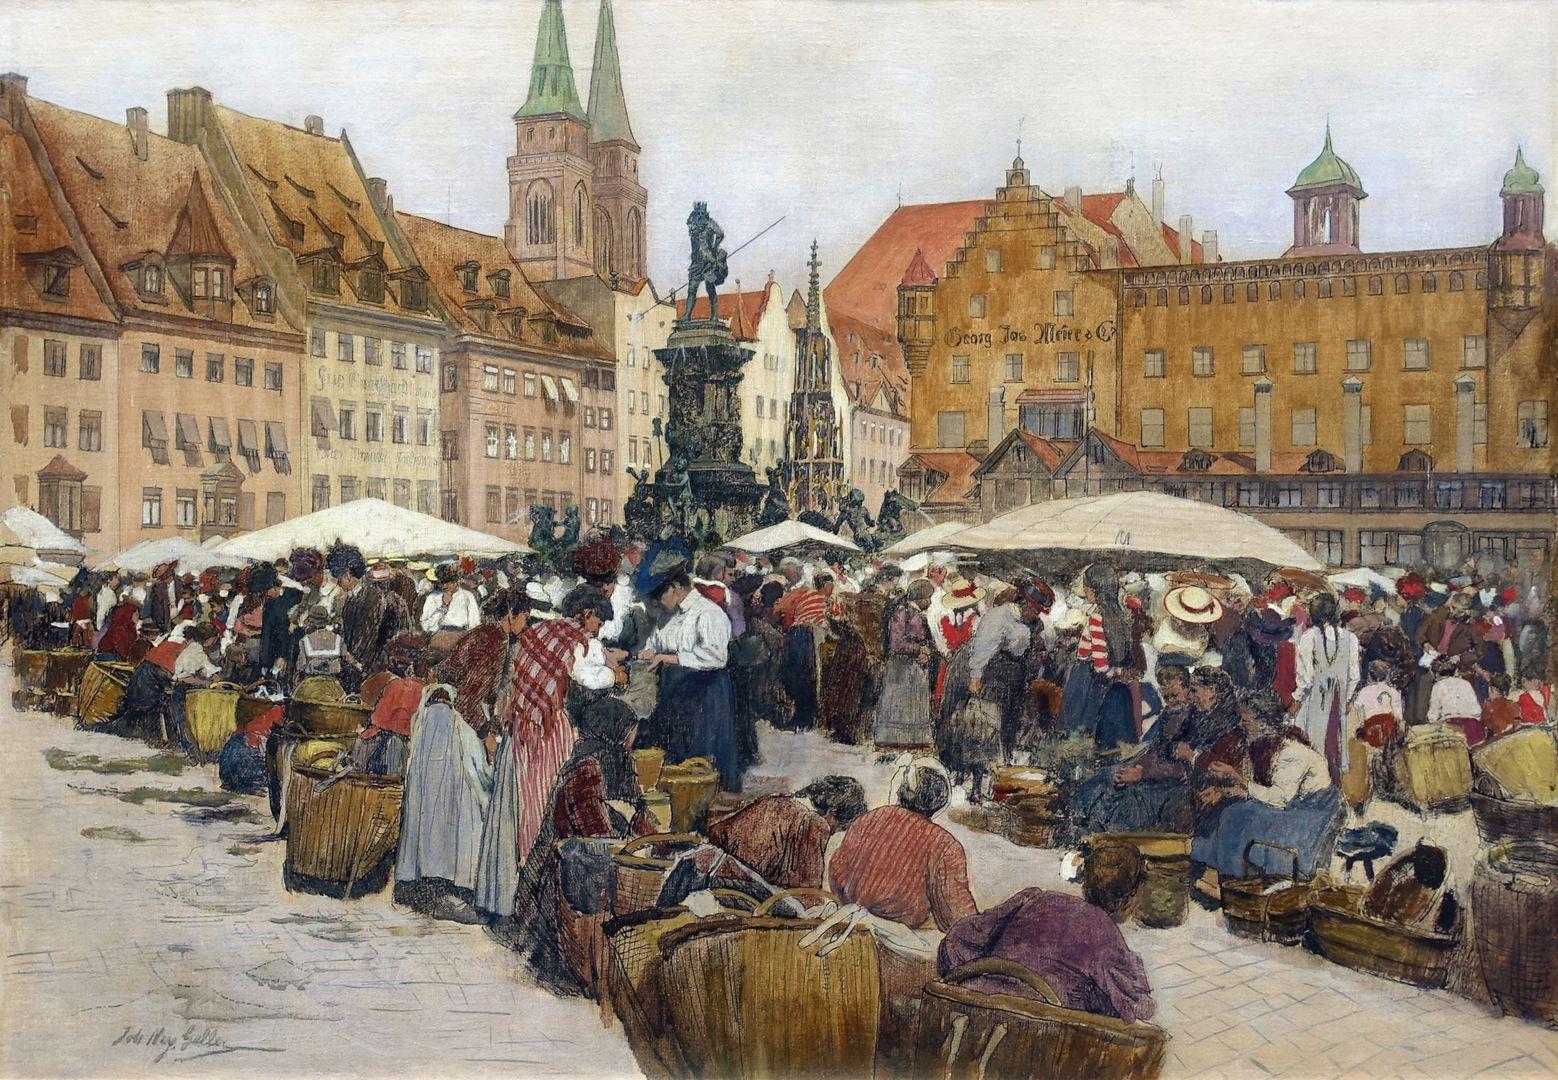 Main market in Nuremberg